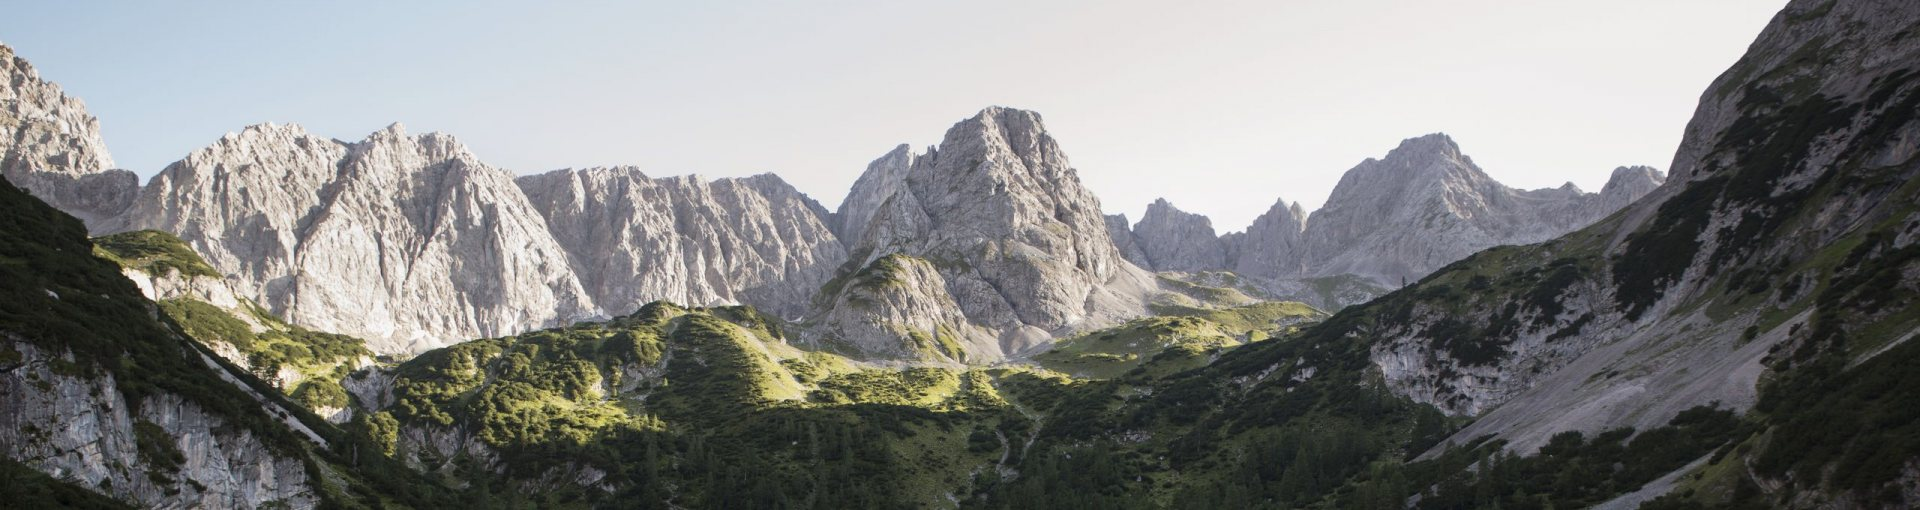 Seebensee Tiroler Zugspitz Arena © Tirol Werbung